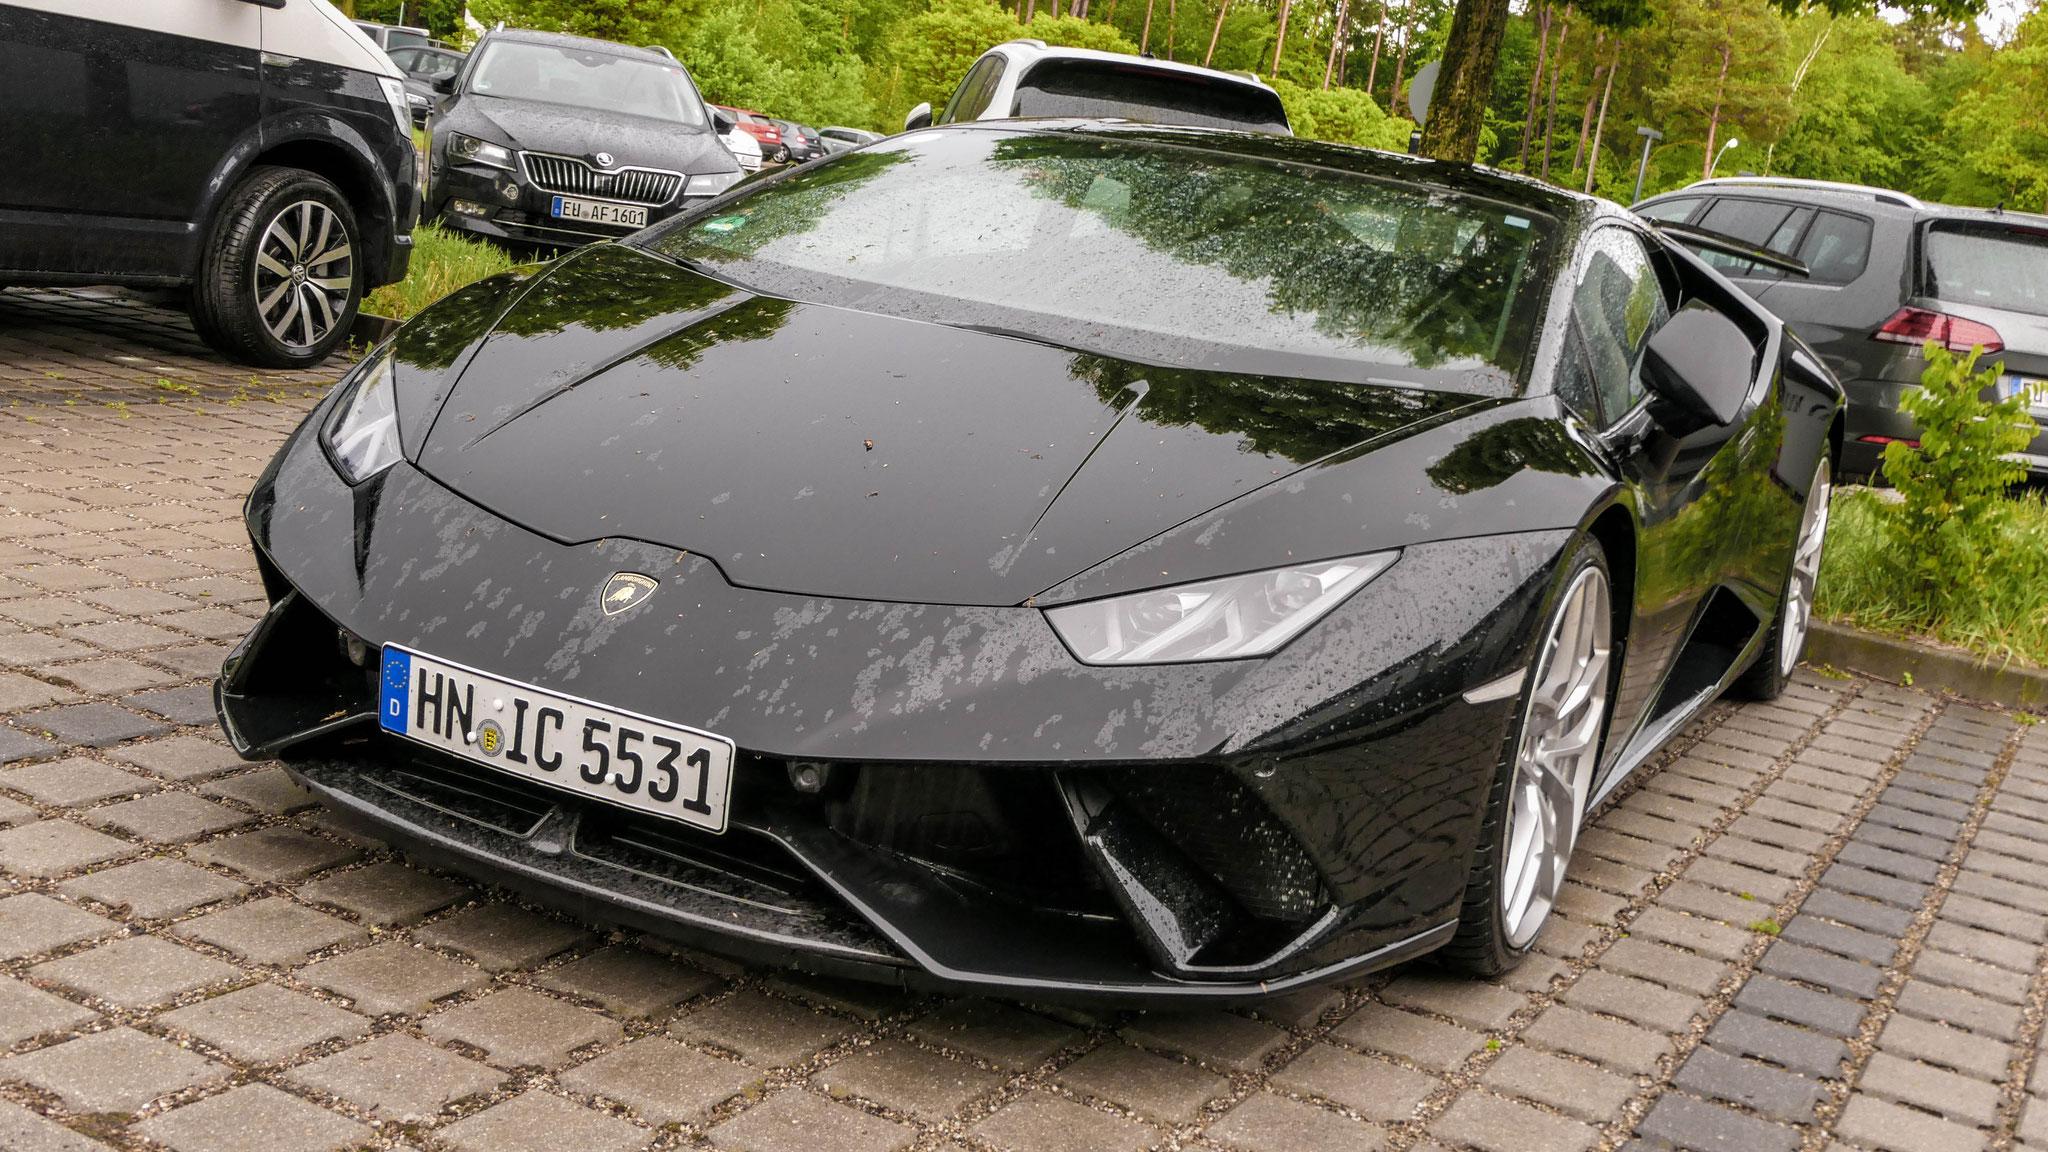 Lamborghini Huracan Performante - HN-IC-5531